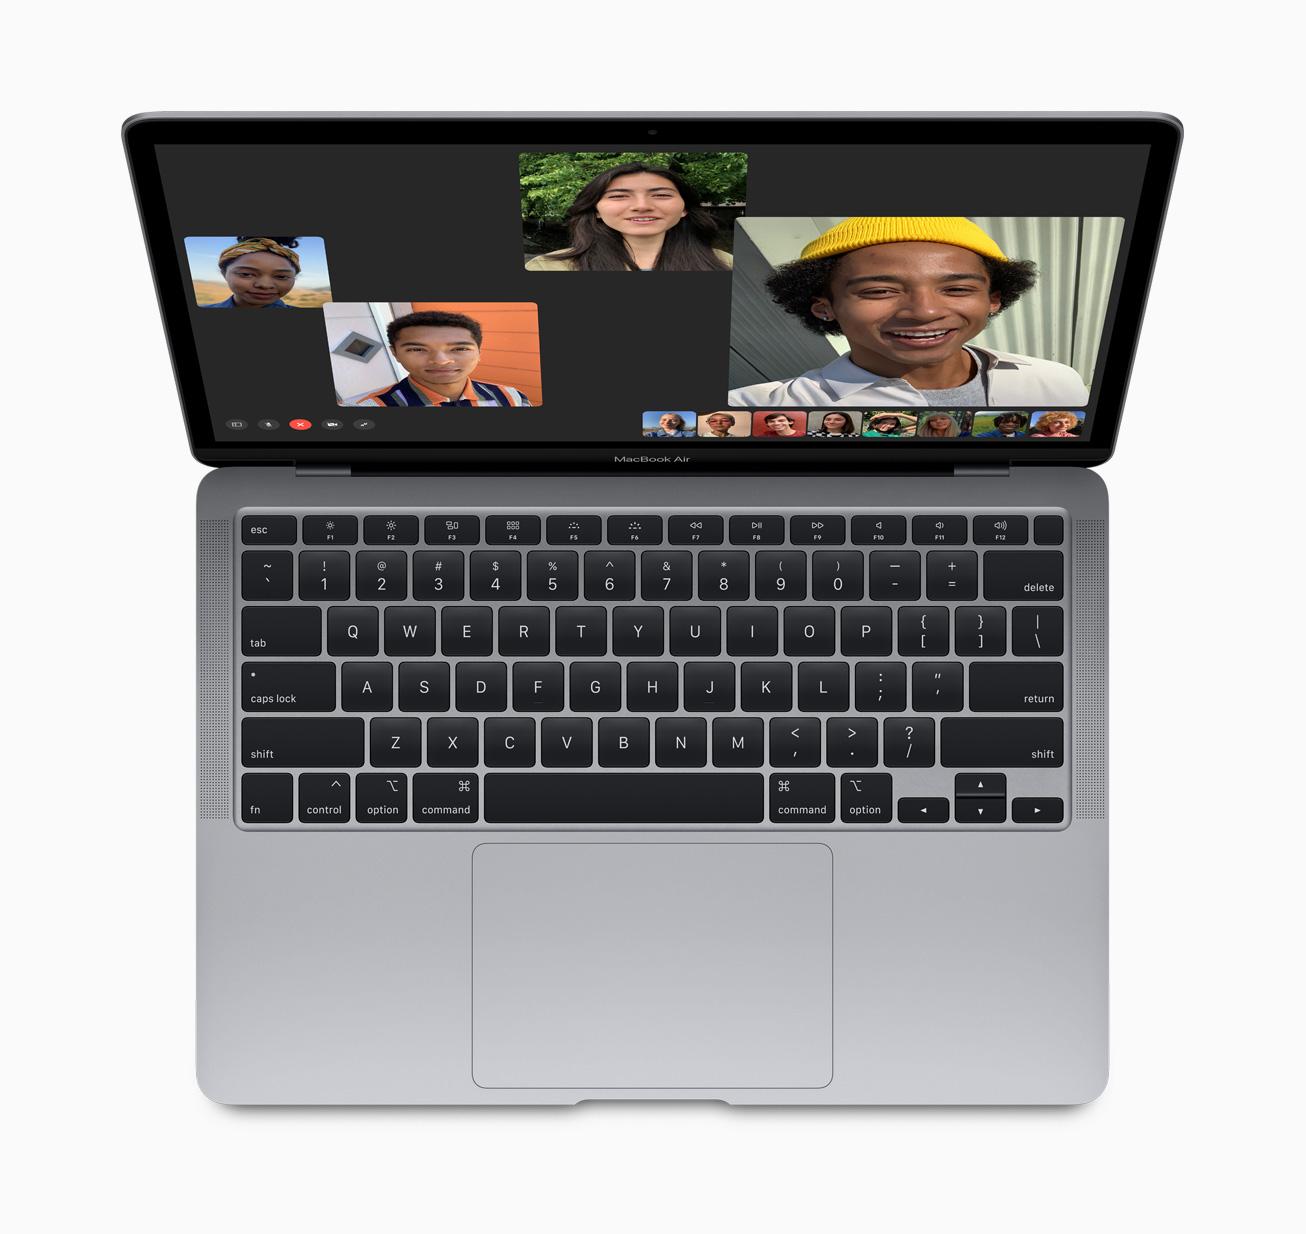 Early Black Friday Discounts At B&H Photo: 16″ MacBook